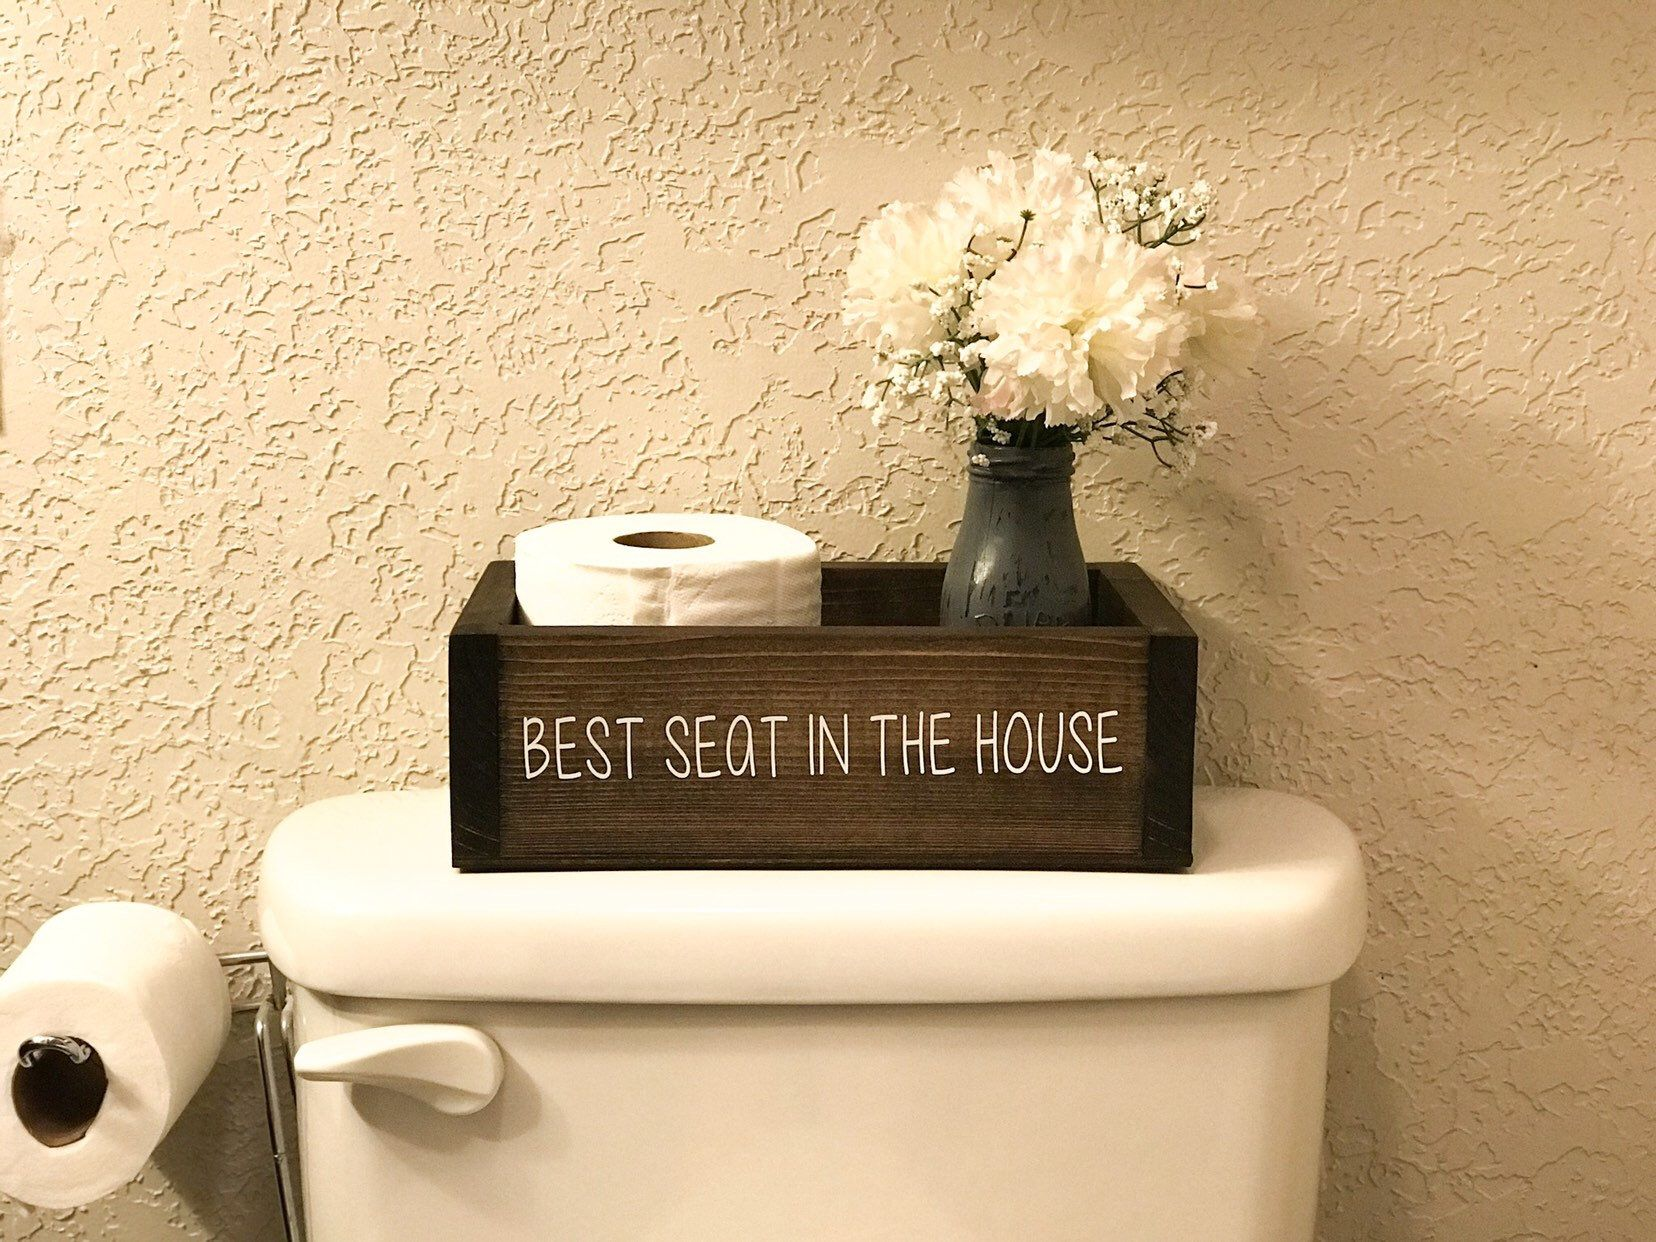 Best Seat In The House Bathroom Box Toilet Paper Holder Toilet Paper Basket Bathroom Storage Bathroom Humor Funny Bathroom Decor In 2020 Funny Bathroom Decor Kid Bathroom Decor Bathroom Box